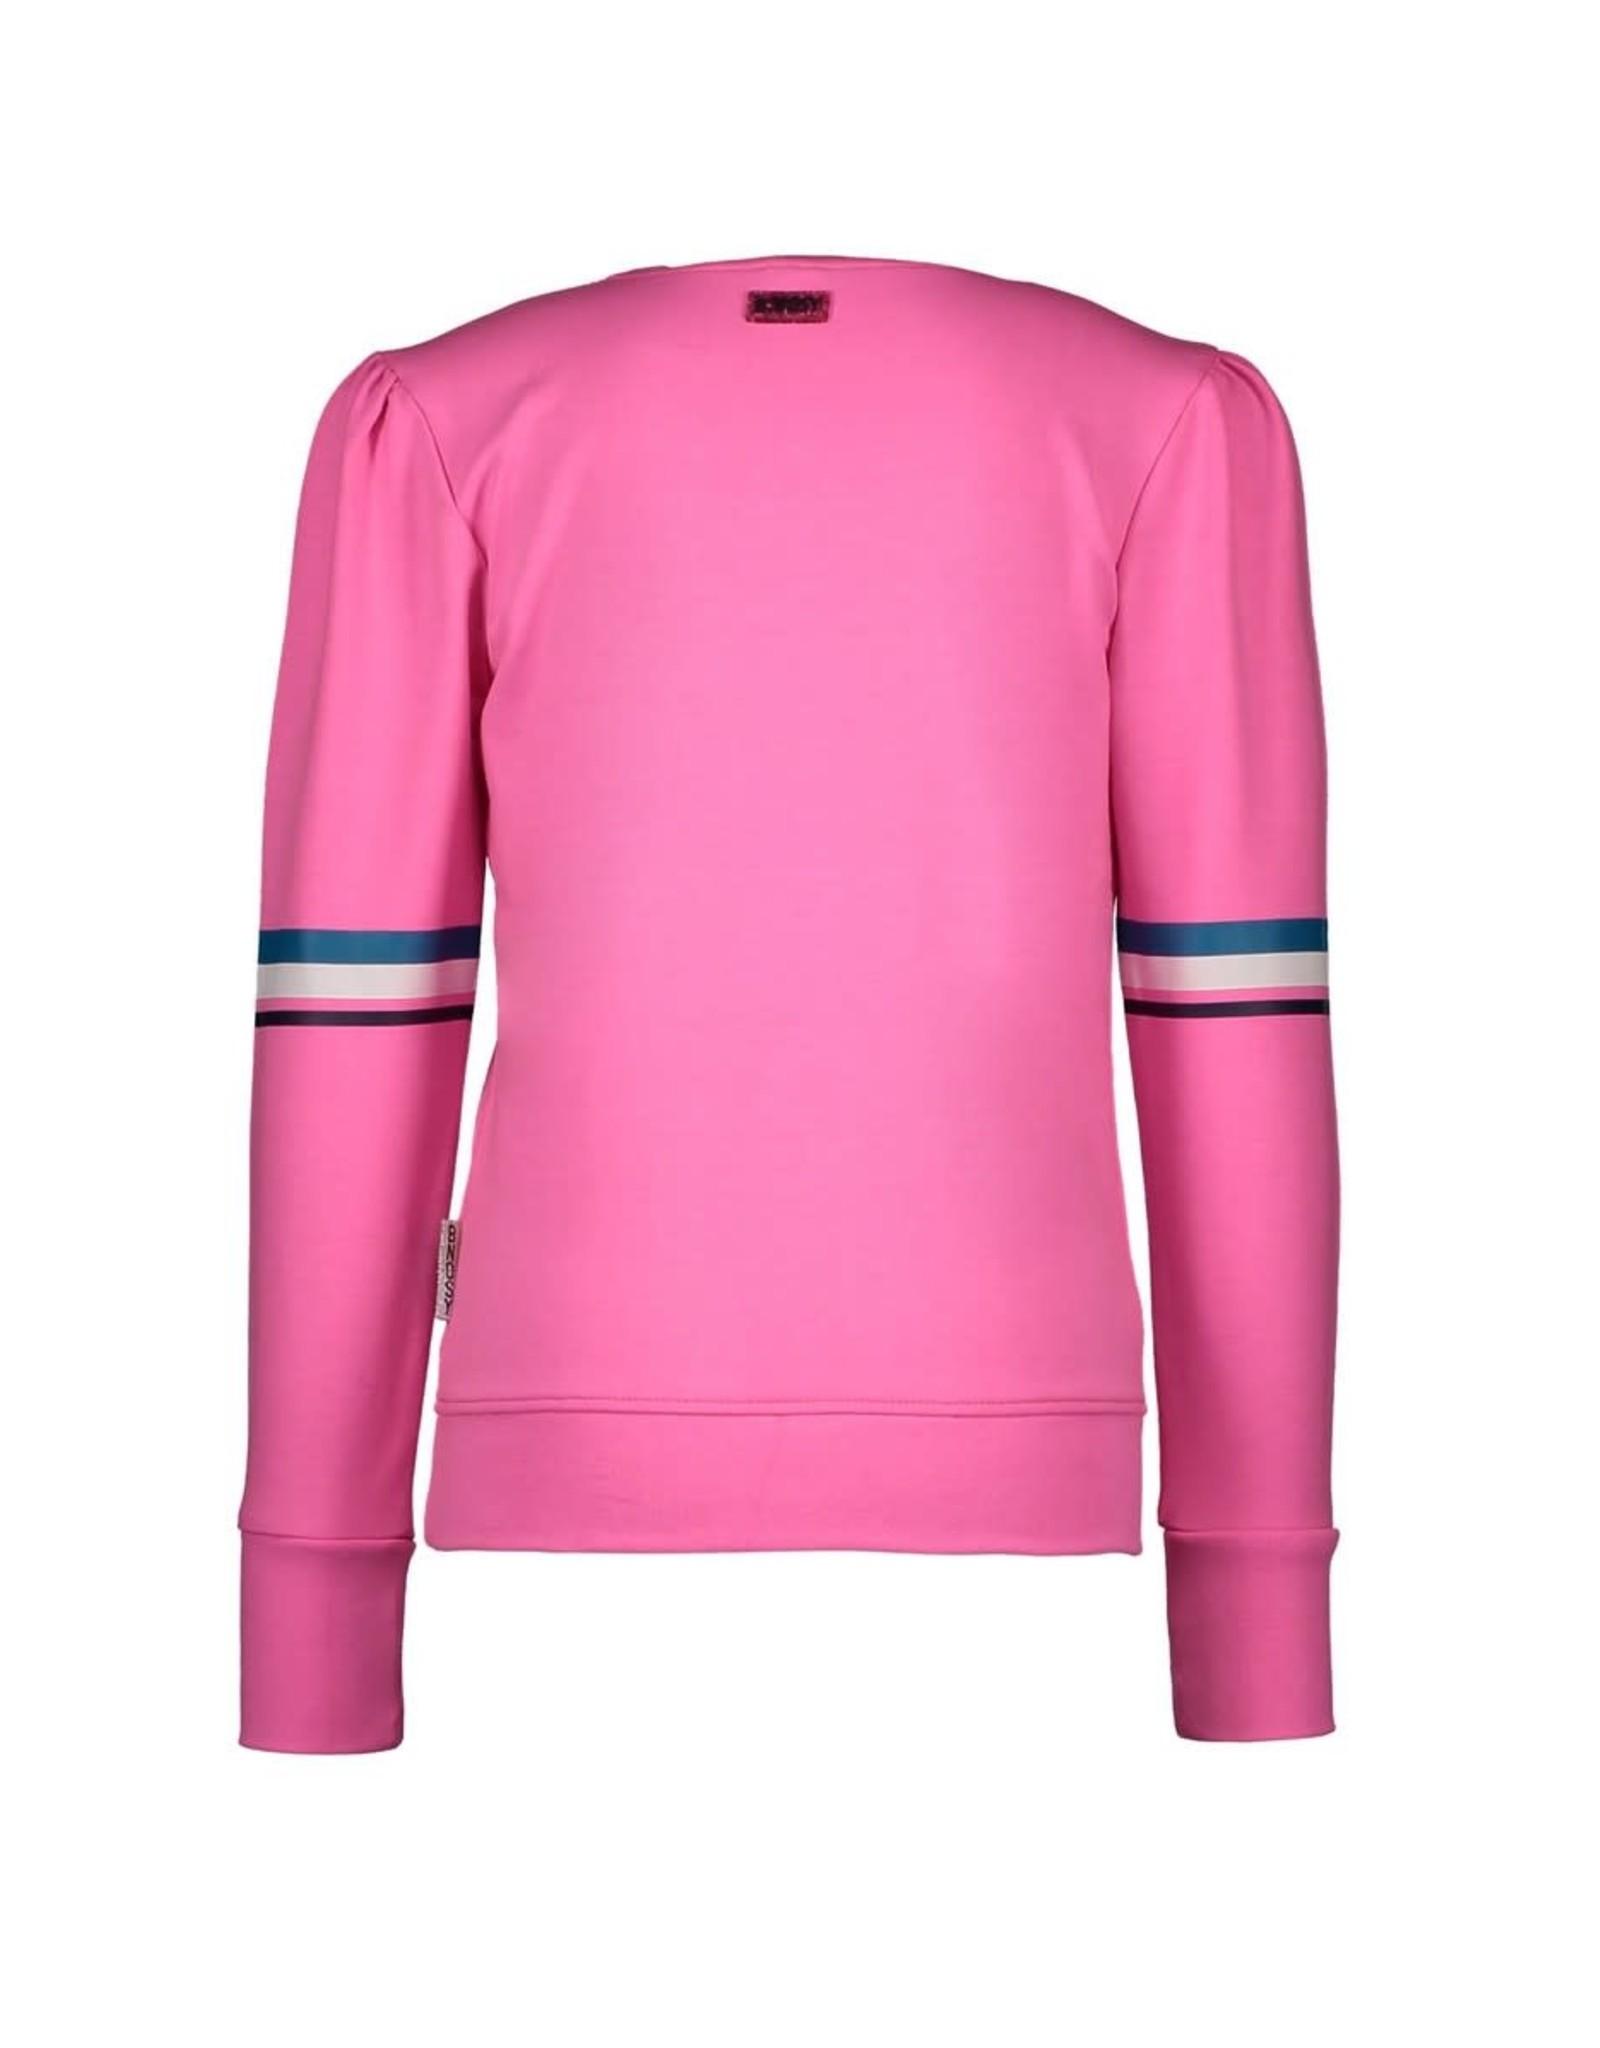 B.Nosy B.Nosy meisjes sweater Sugar Plum S21